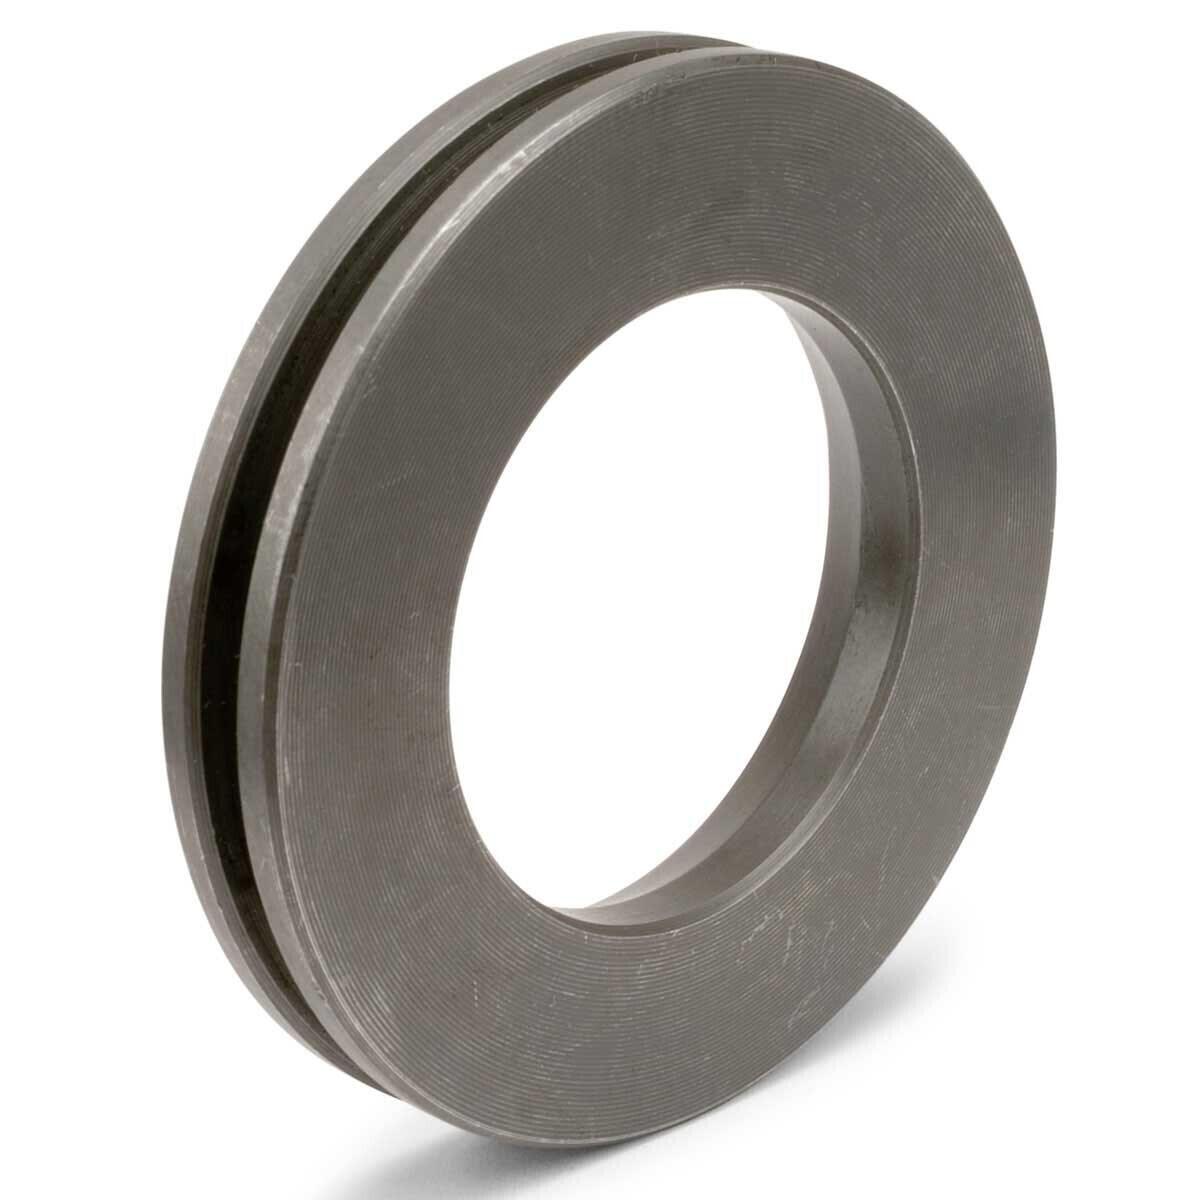 MK RS Ring Saw Blade Drive Wheel